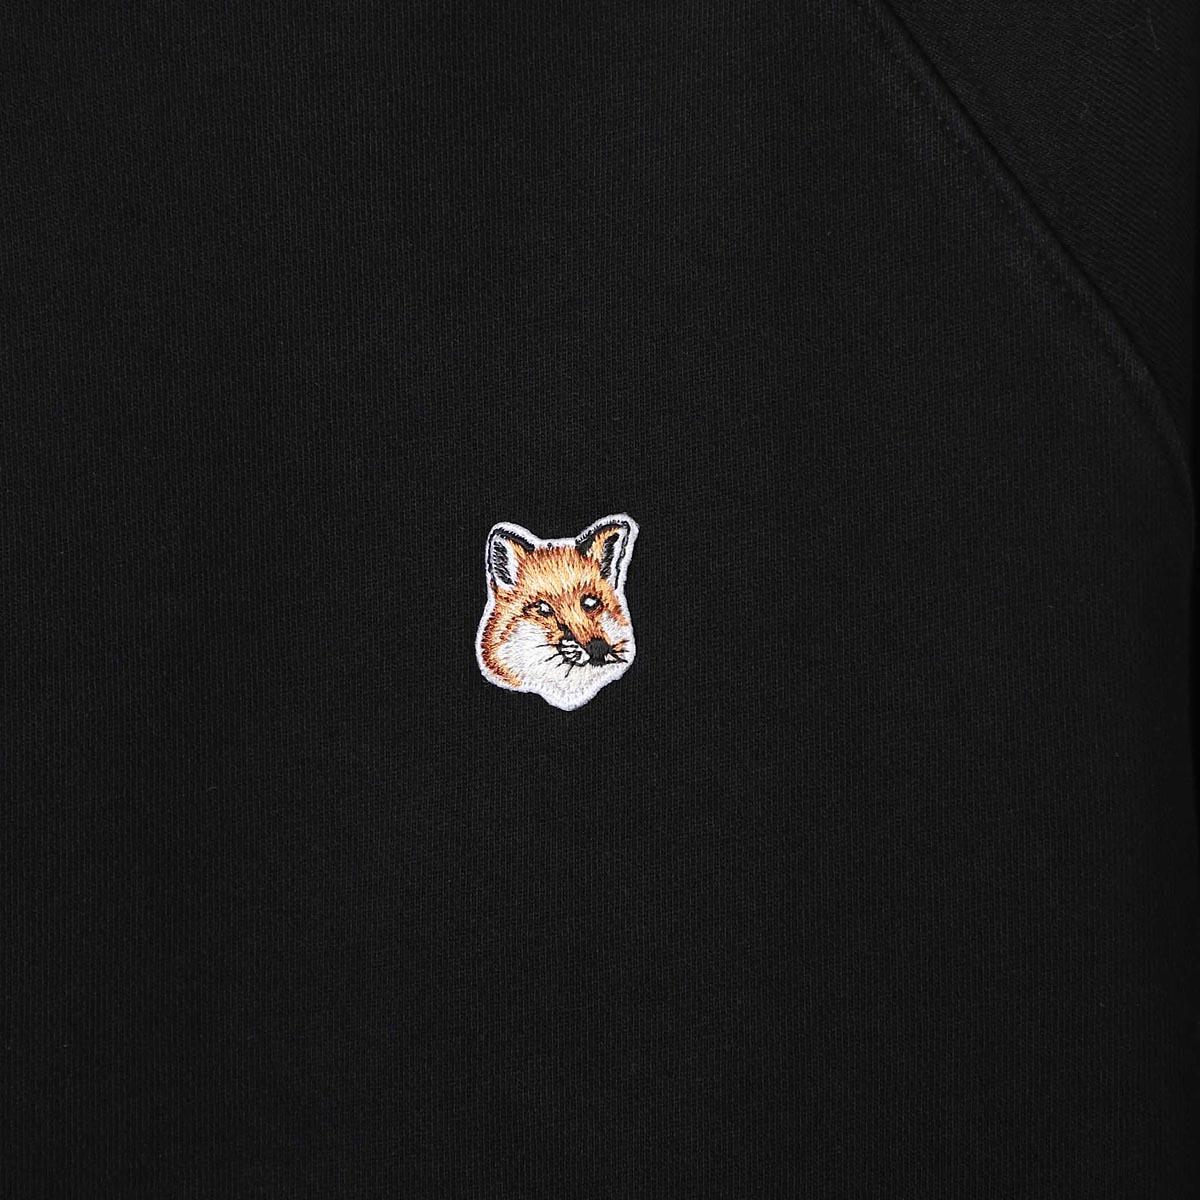 MAISON KITSUNE メゾンキツネ スウェットシャツ/SWEATSHIRT FOX HEAD PATCH メンズ